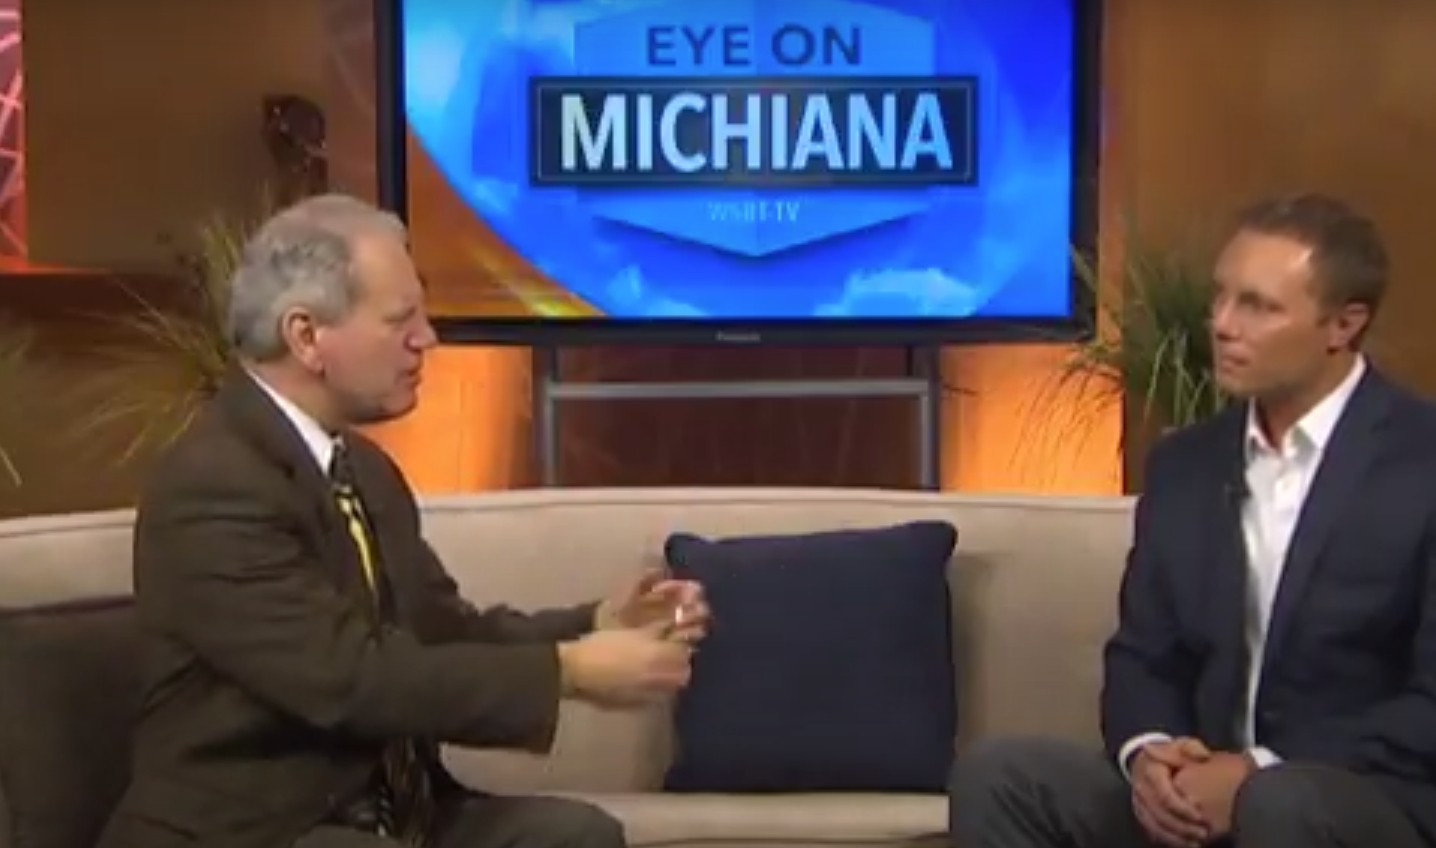 eye on michiana